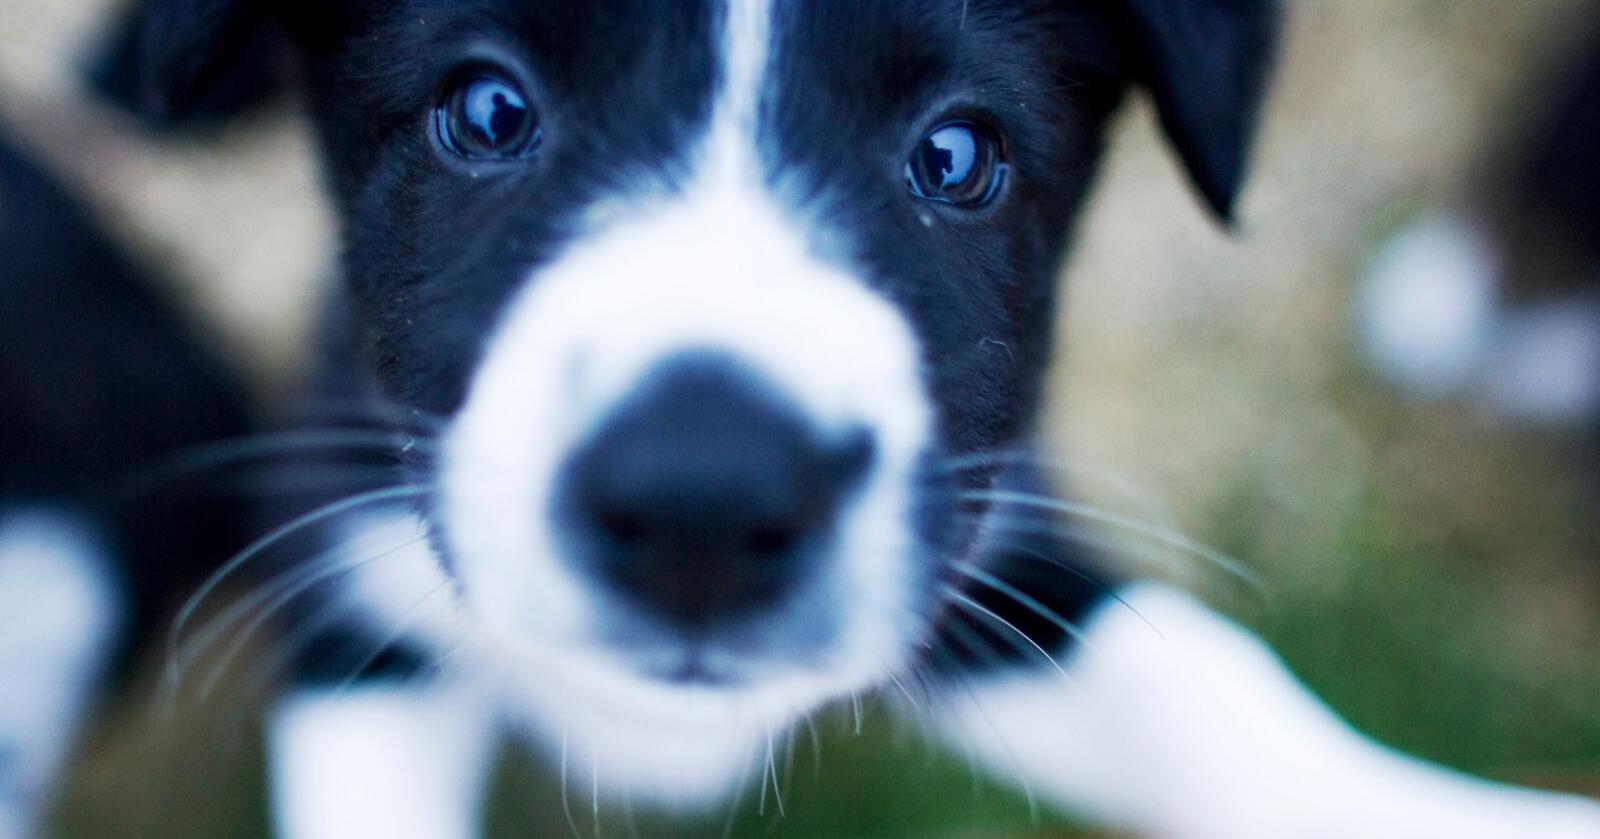 Politiet har i sommer allerede reddet flere fortvilede hunder fra varme biler. NAF advarer om at dette skjer hver sommer Foto: Kyrre Lien / NTB